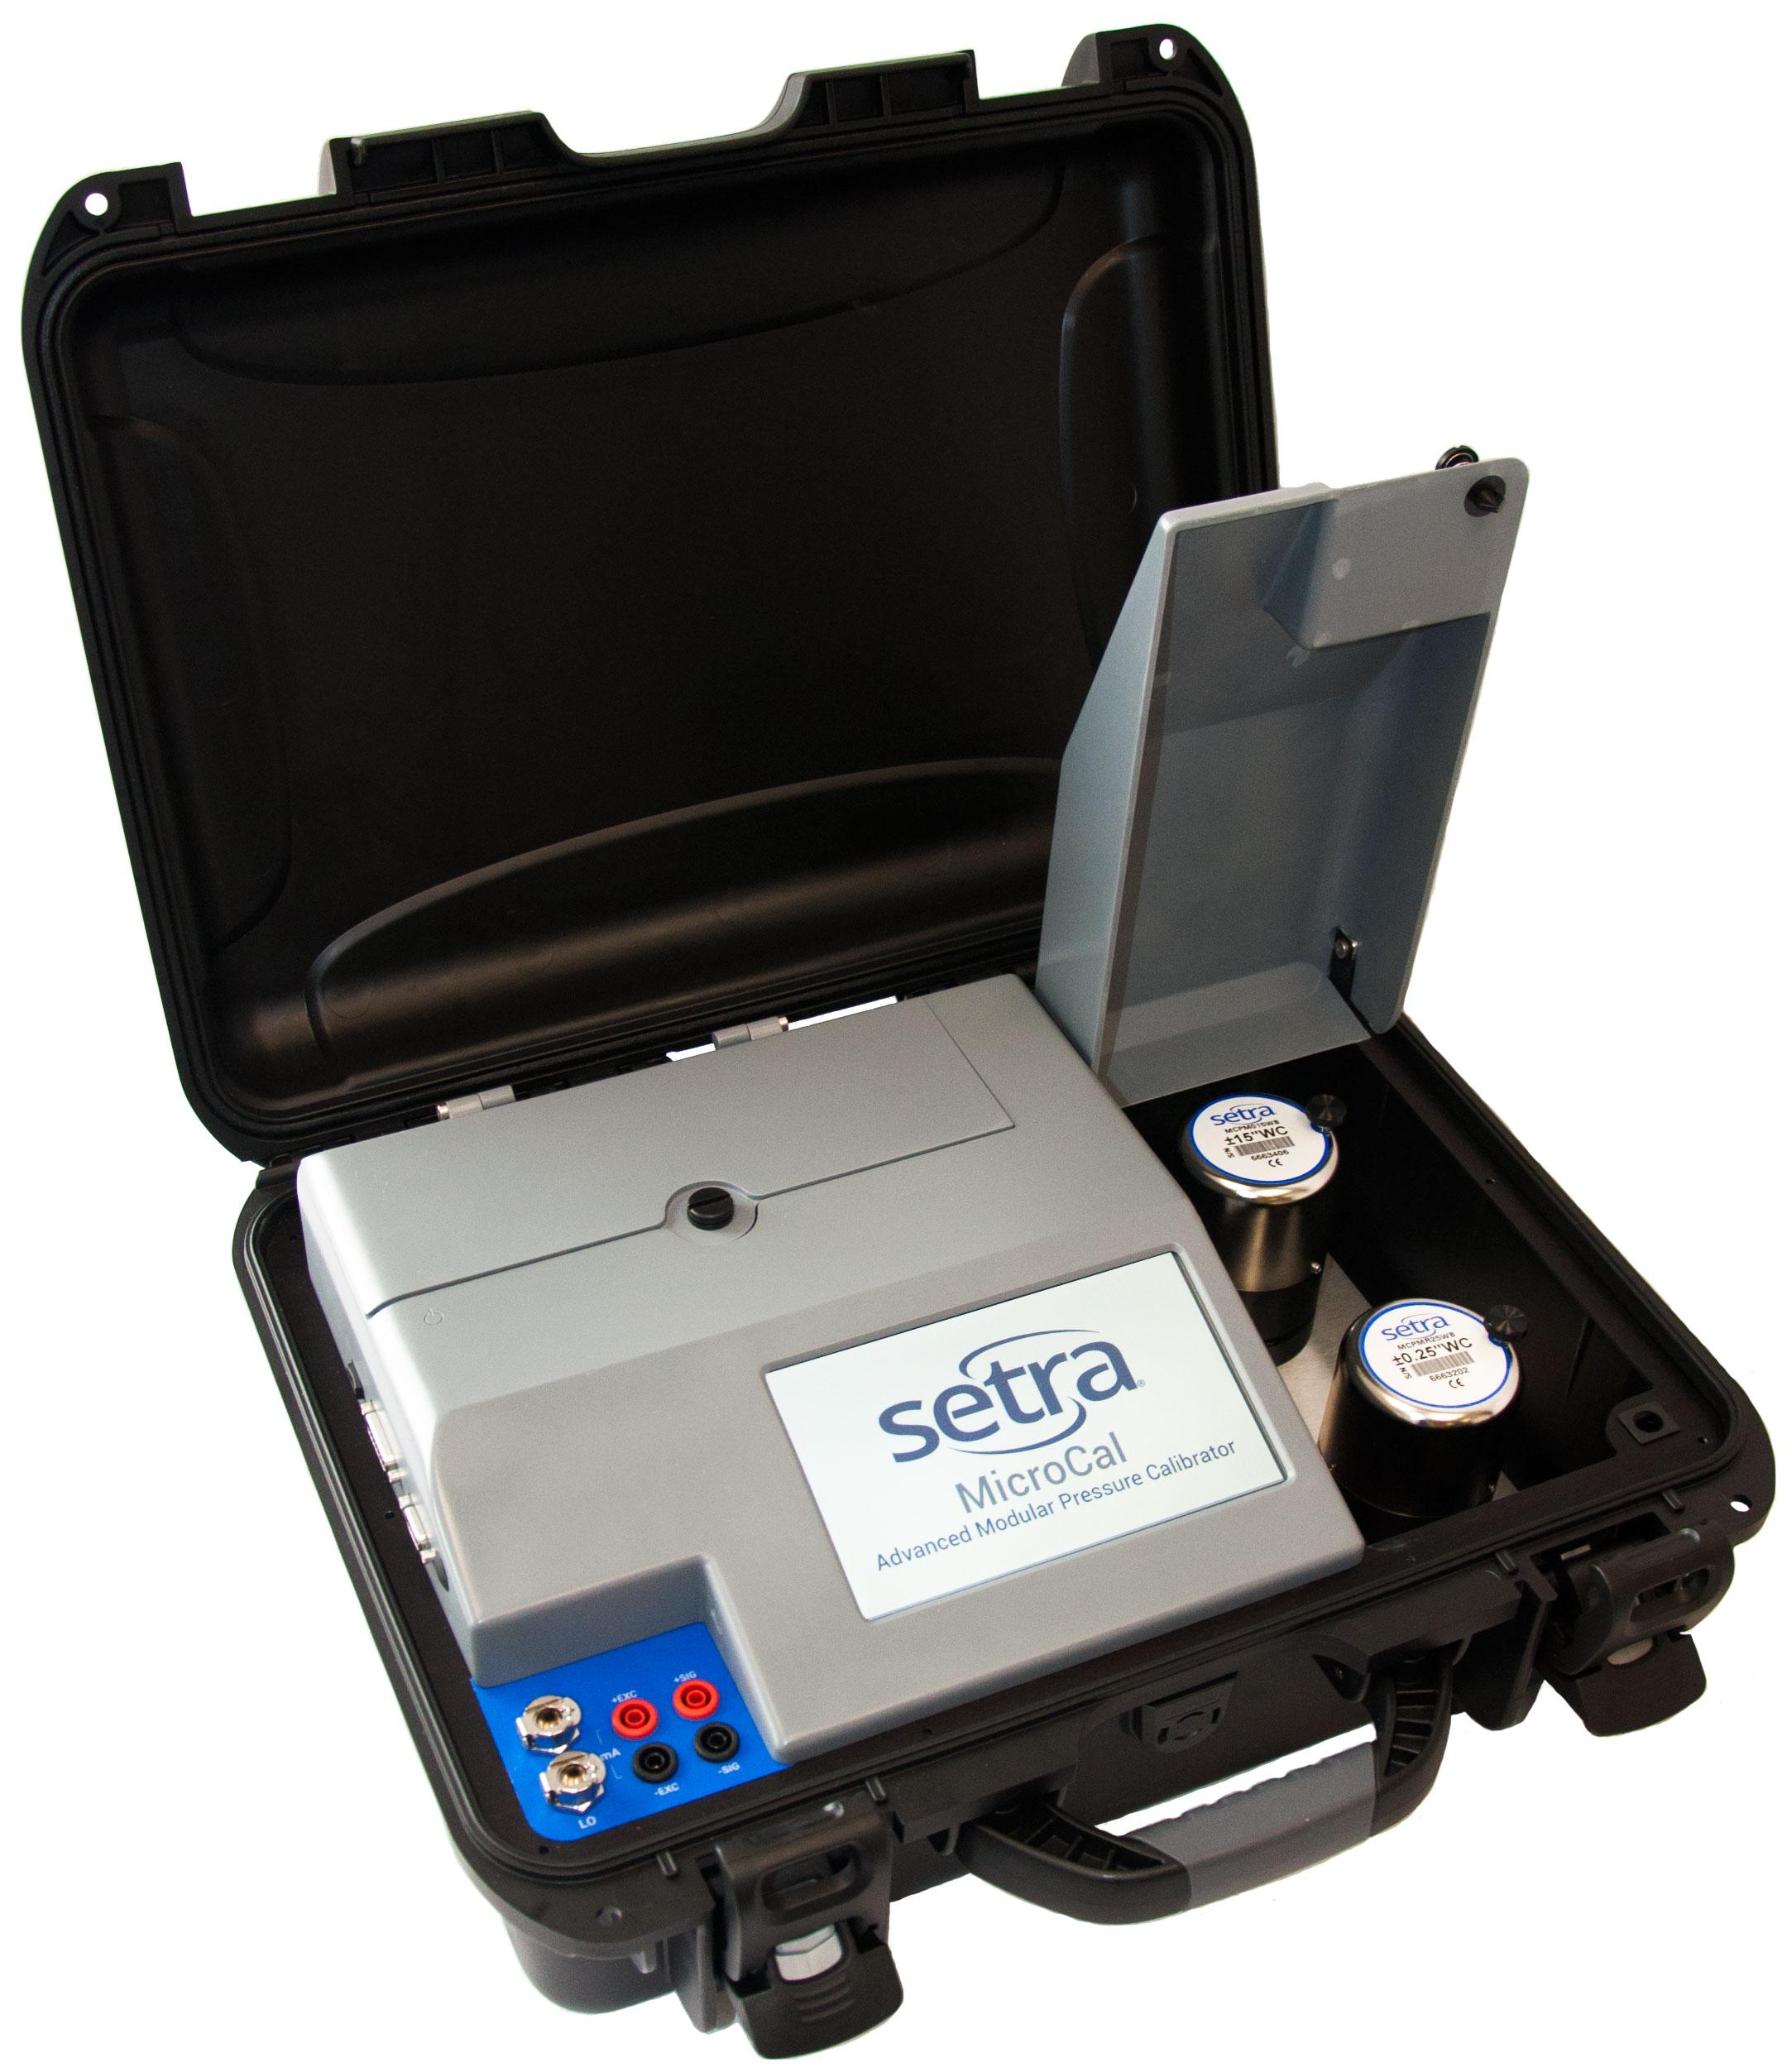 Microcal: Advanced Modular Pressure Calibrator